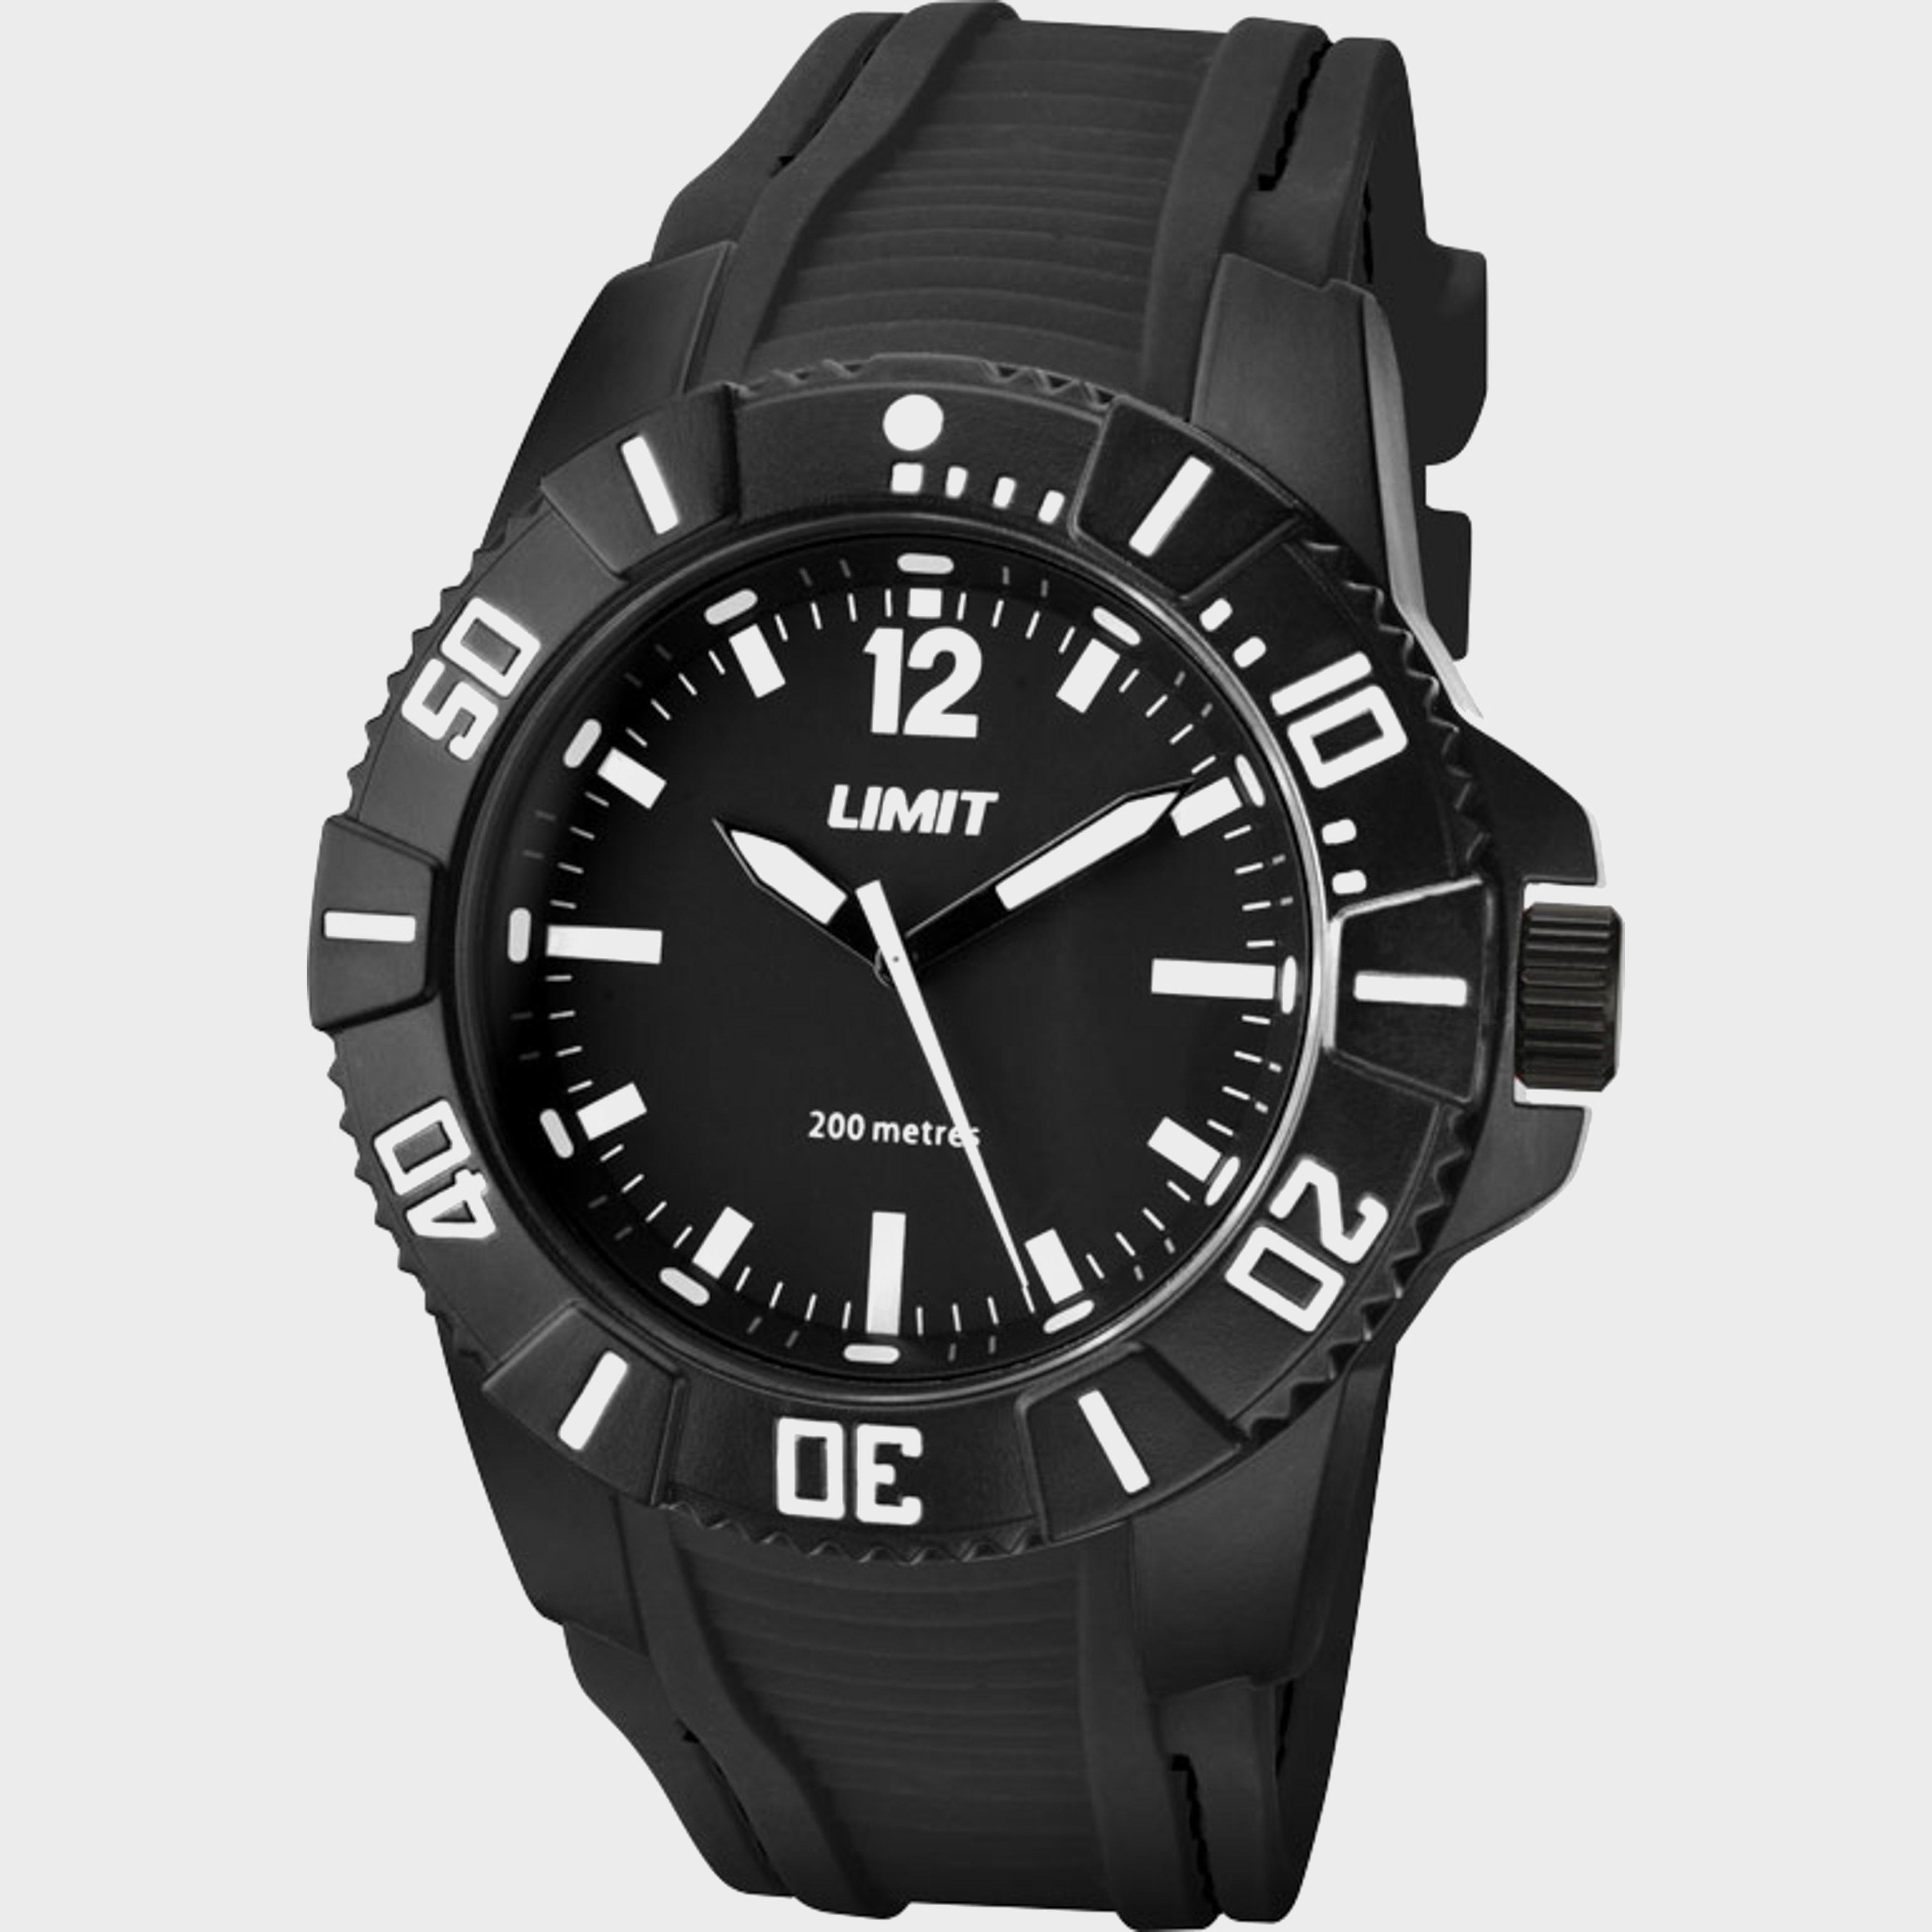 Limit Limit 200m Analogue Watch - Black, Black